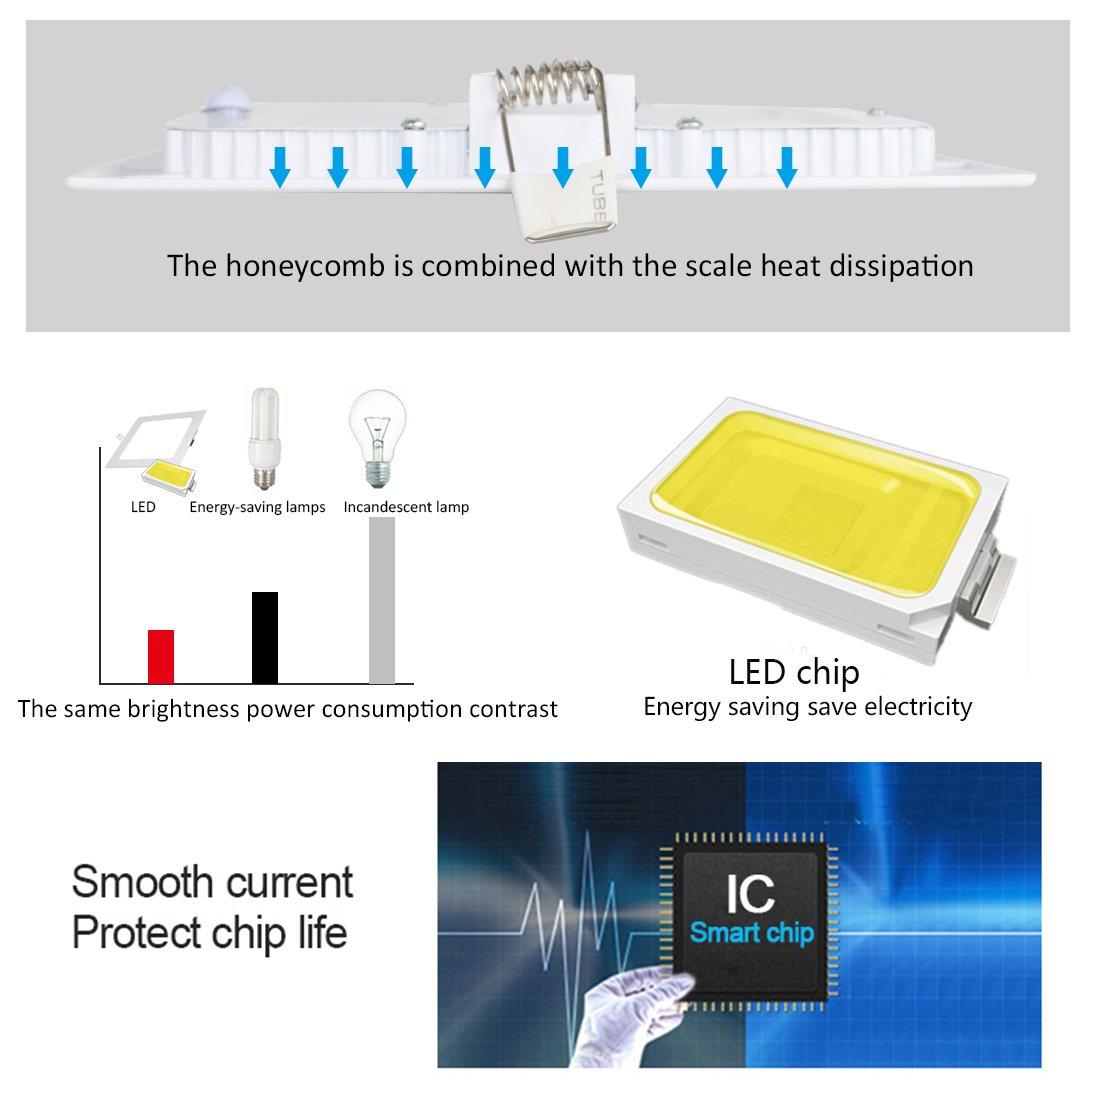 9W Luz de Techo Empotrada LED Cuadrados Panel de Luz Led Downlight Destacar Iluminaci/ón Cocina Ba/ño Corredor 3000K Warm White Tama/ño del Agujero 12.5CM